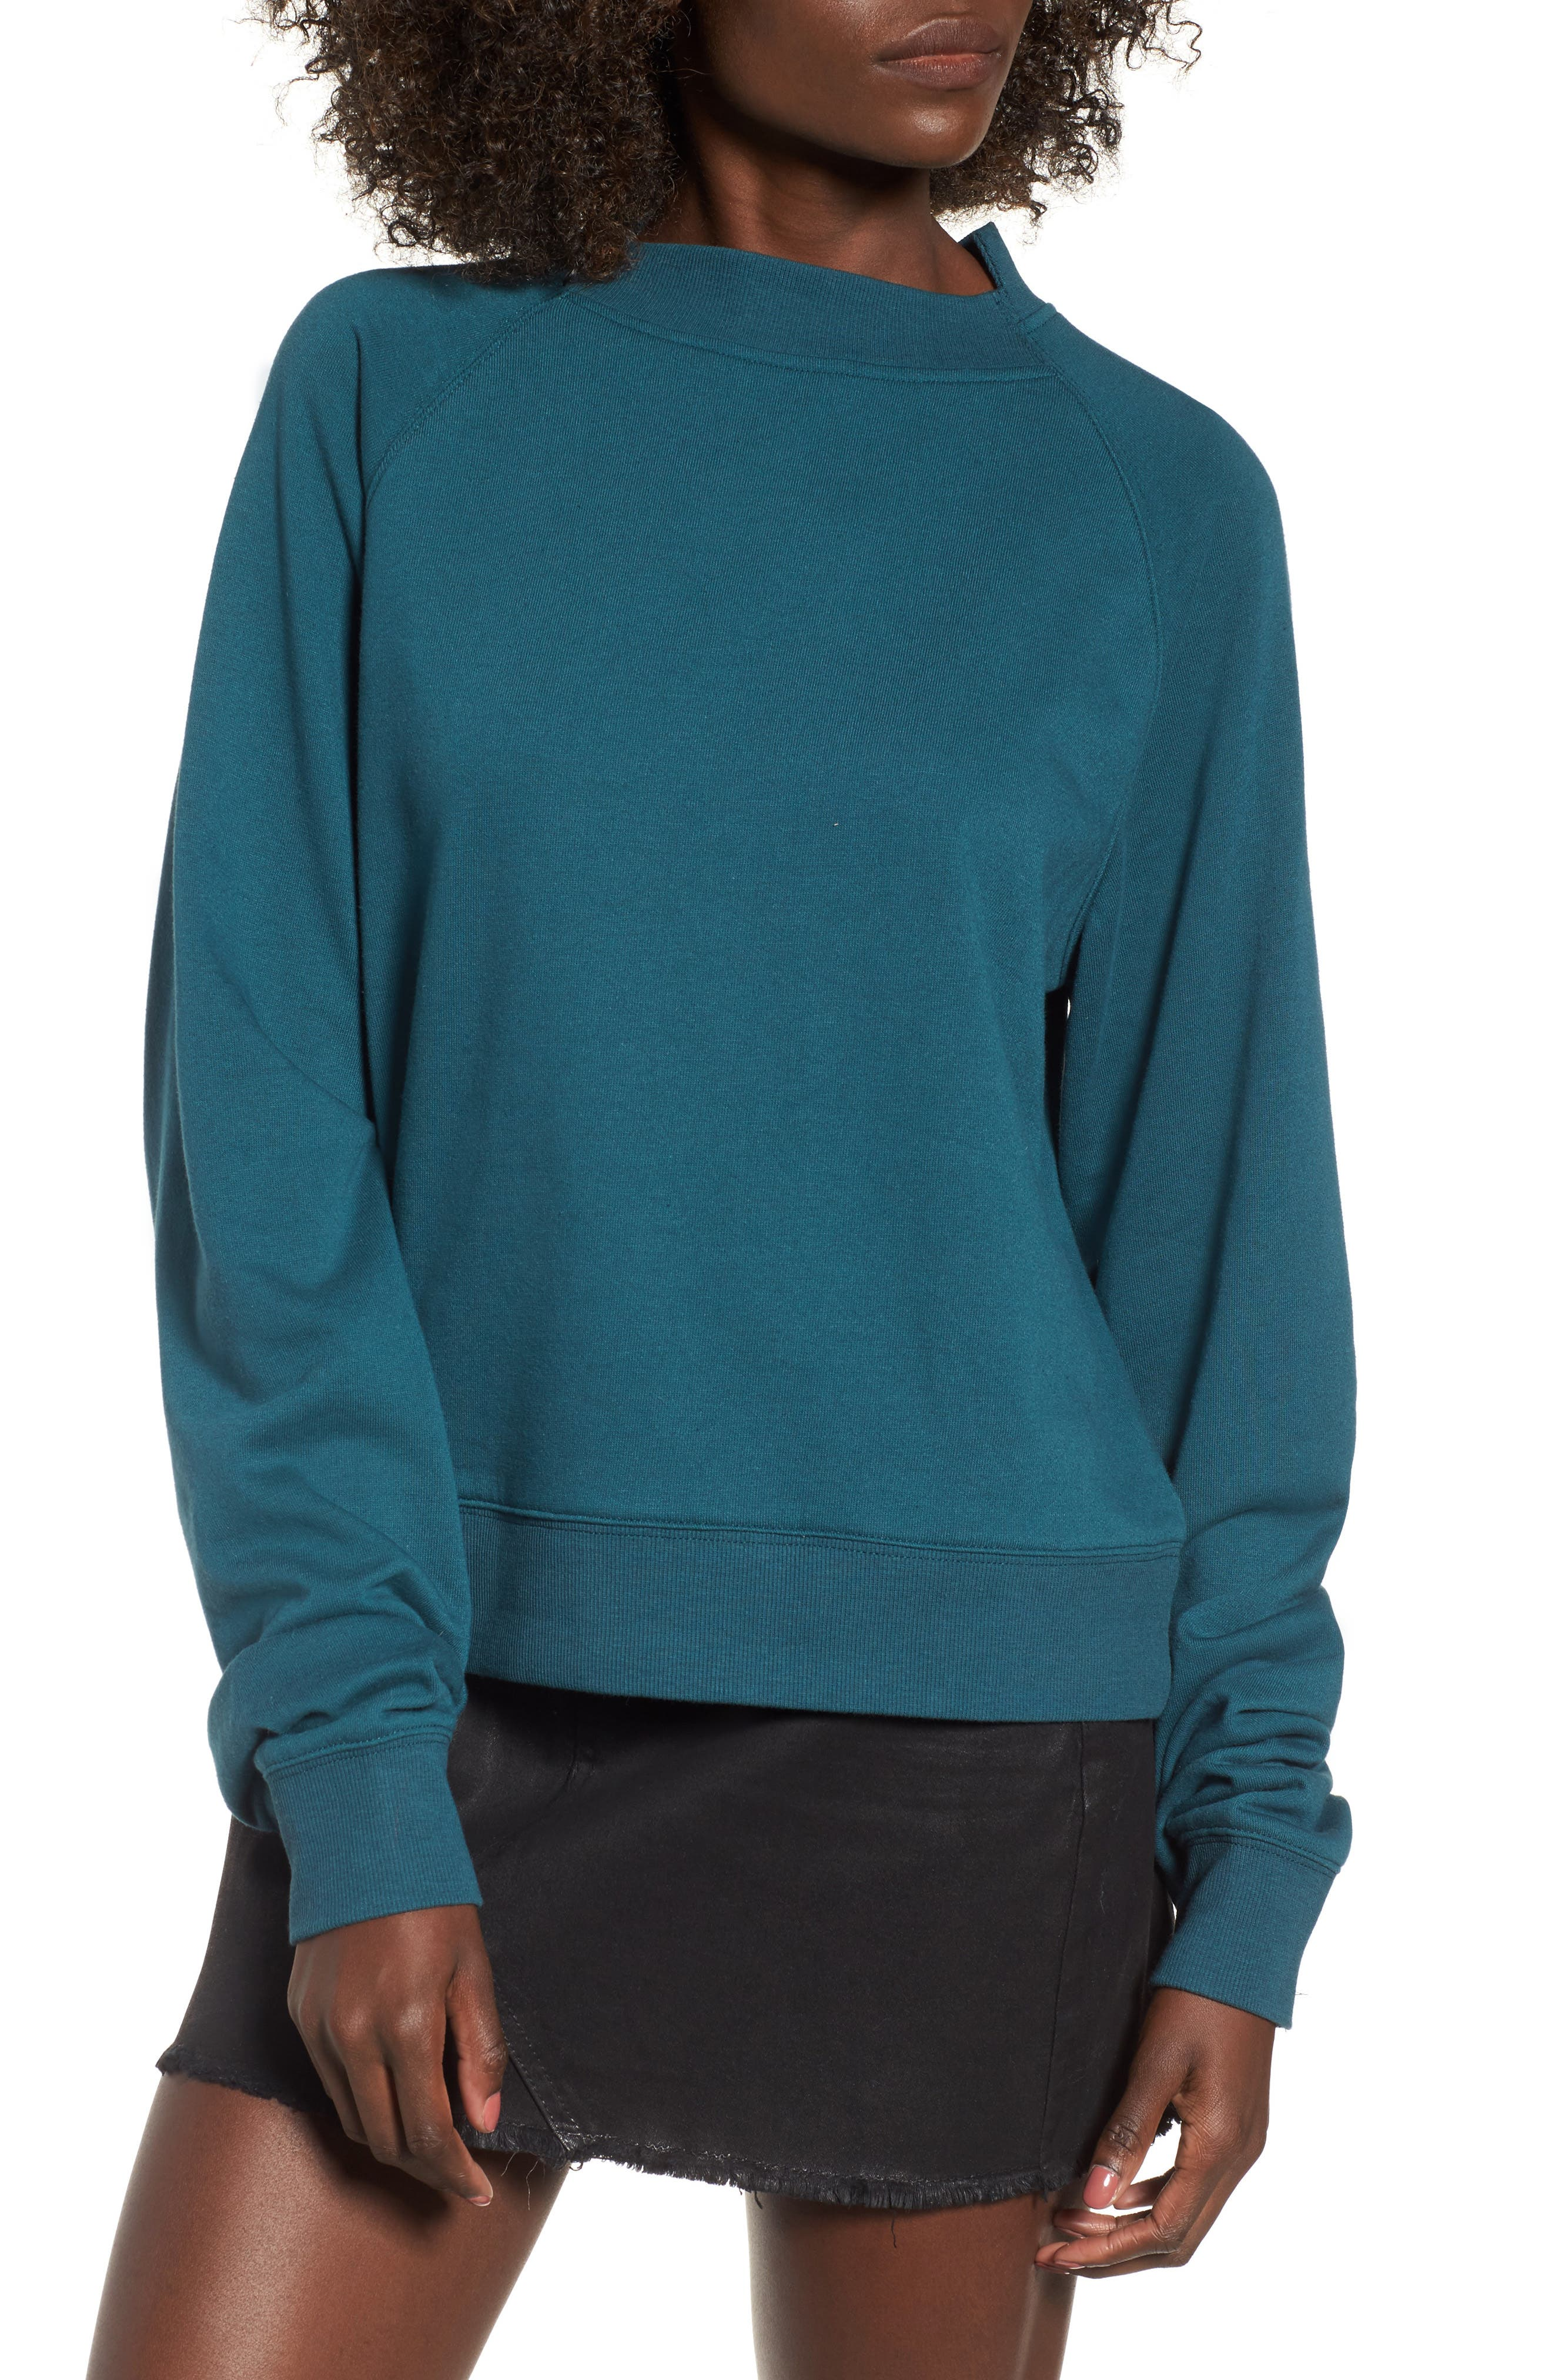 Cinched Sleeve Sweatshirt,                             Main thumbnail 1, color,                             Teal